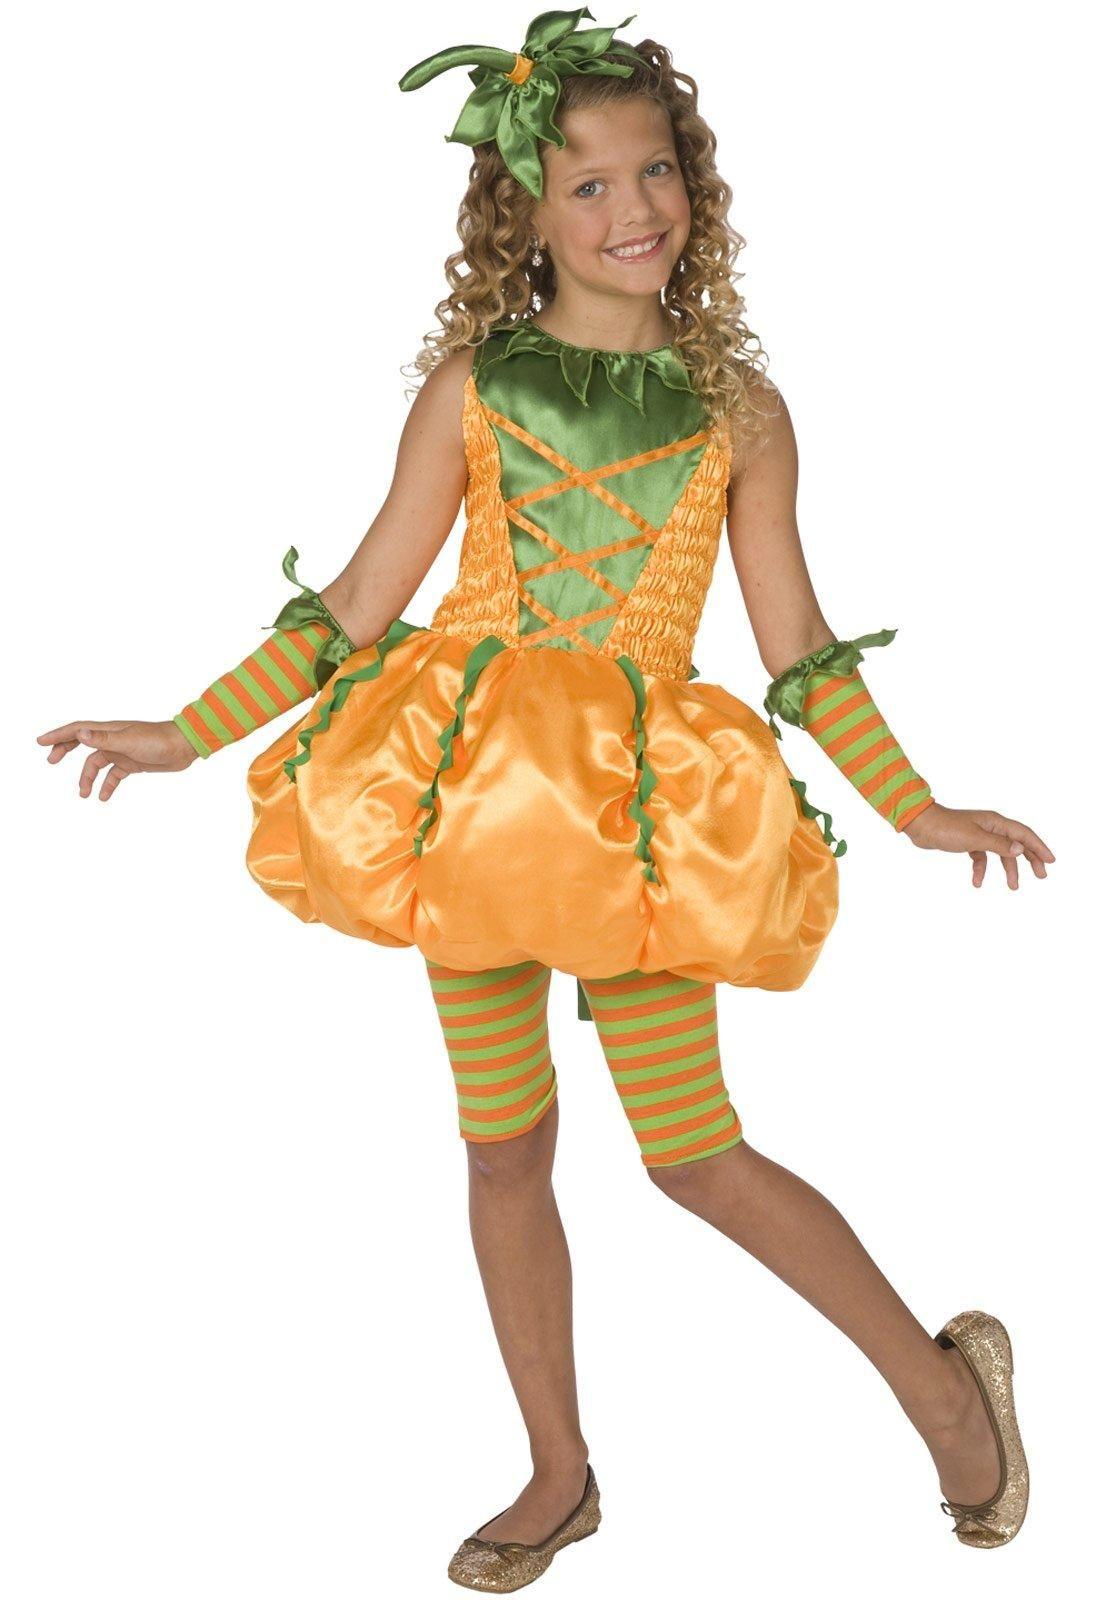 Precious Pumpkin Child Costume from Buycostumes.com  sc 1 st  Pinterest & Precious Pumpkin Child Costume | Children costumes Costumes and ...